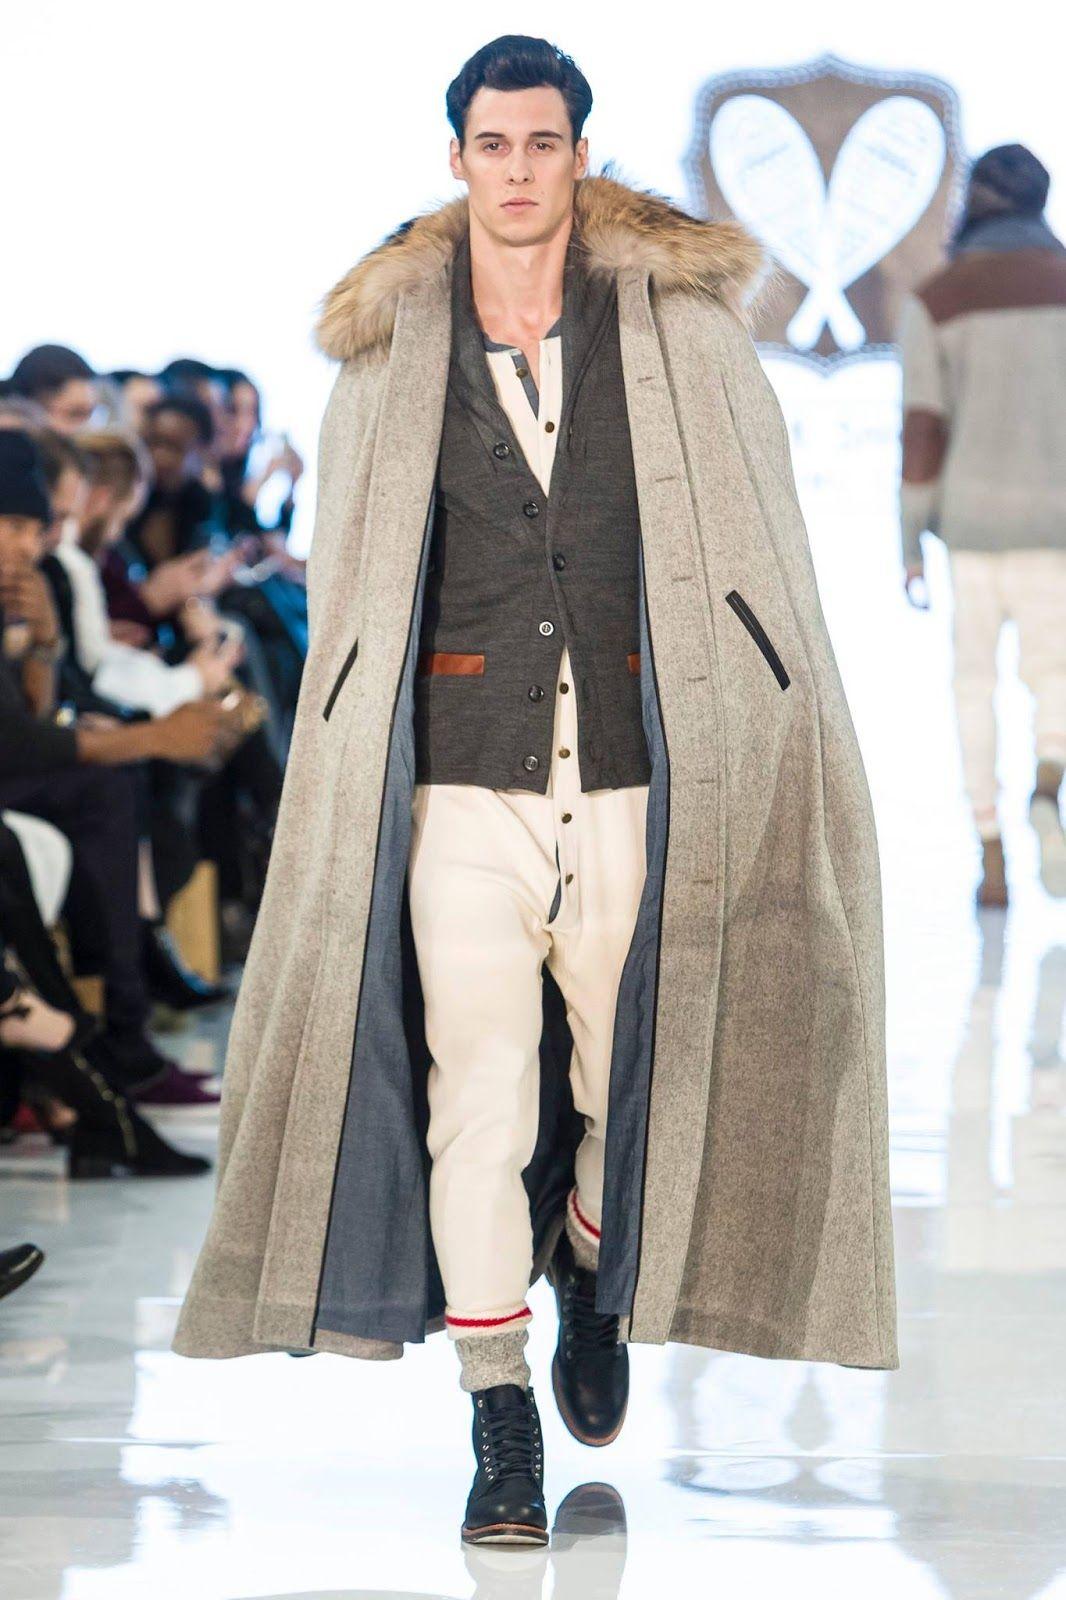 Tuck Shop Co. Fall/Winter 2016 – Toronto Mens Fashion Week